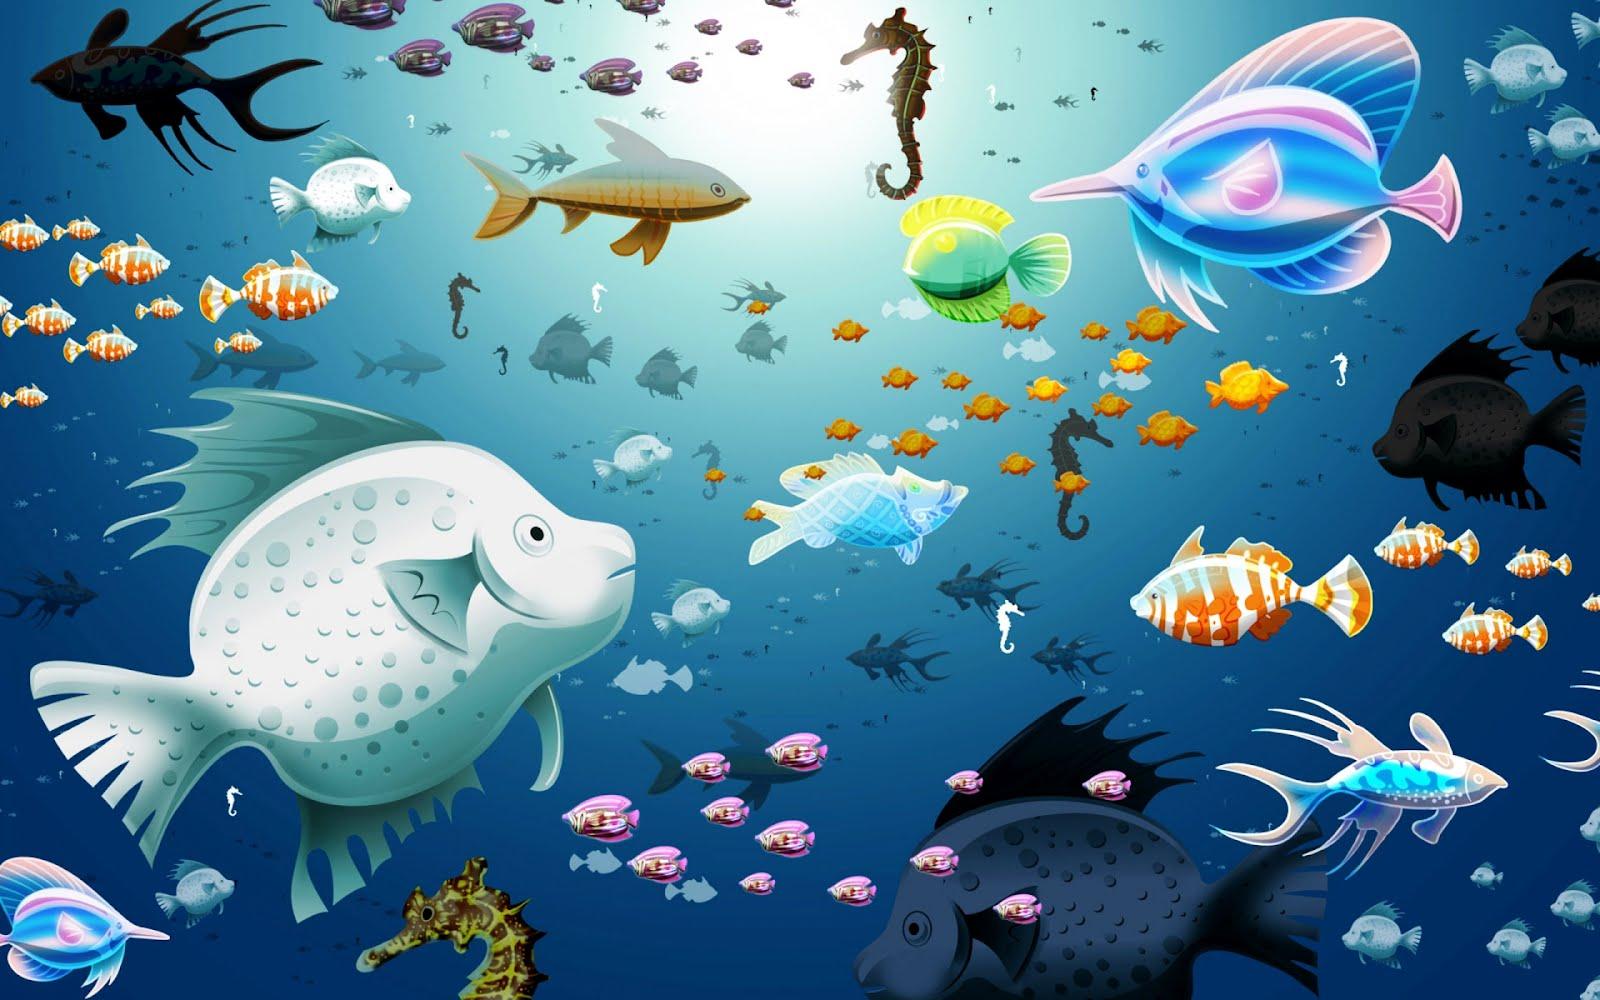 http://4.bp.blogspot.com/-U9N3-2MUDvg/T3pc1fgyTkI/AAAAAAAA0R8/Mdt7NR52s4U/s1600/happy-fish-world-1920x1200-wallpaper-mundo-feliz-de-los-peces-en-el-fo